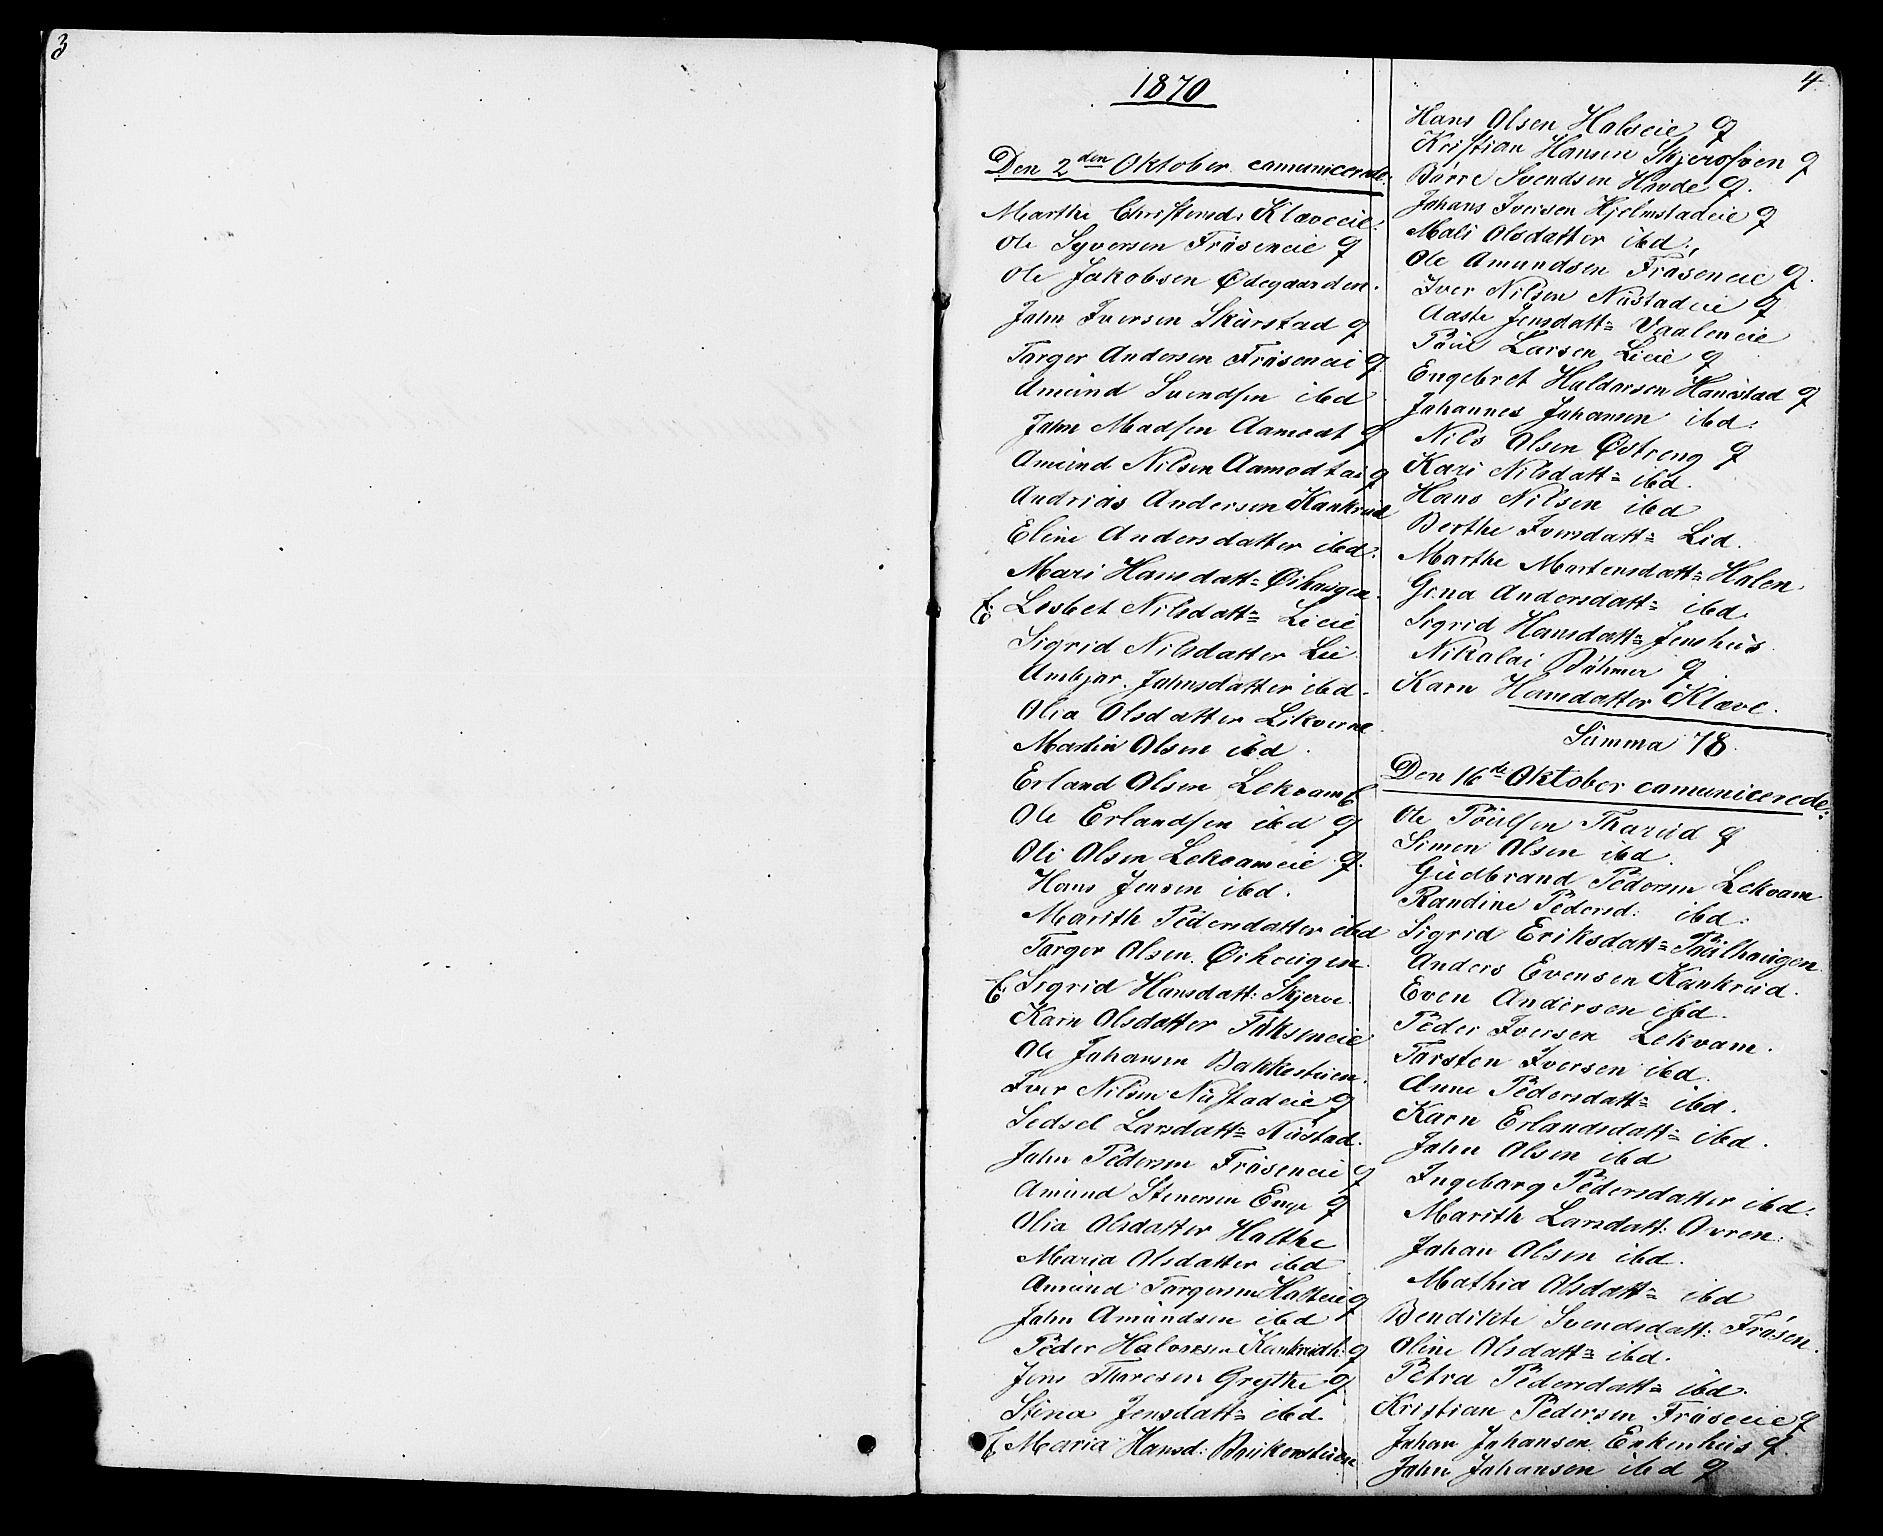 SAH, Østre Gausdal prestekontor, Klokkerbok nr. 1, 1863-1893, s. 3-4